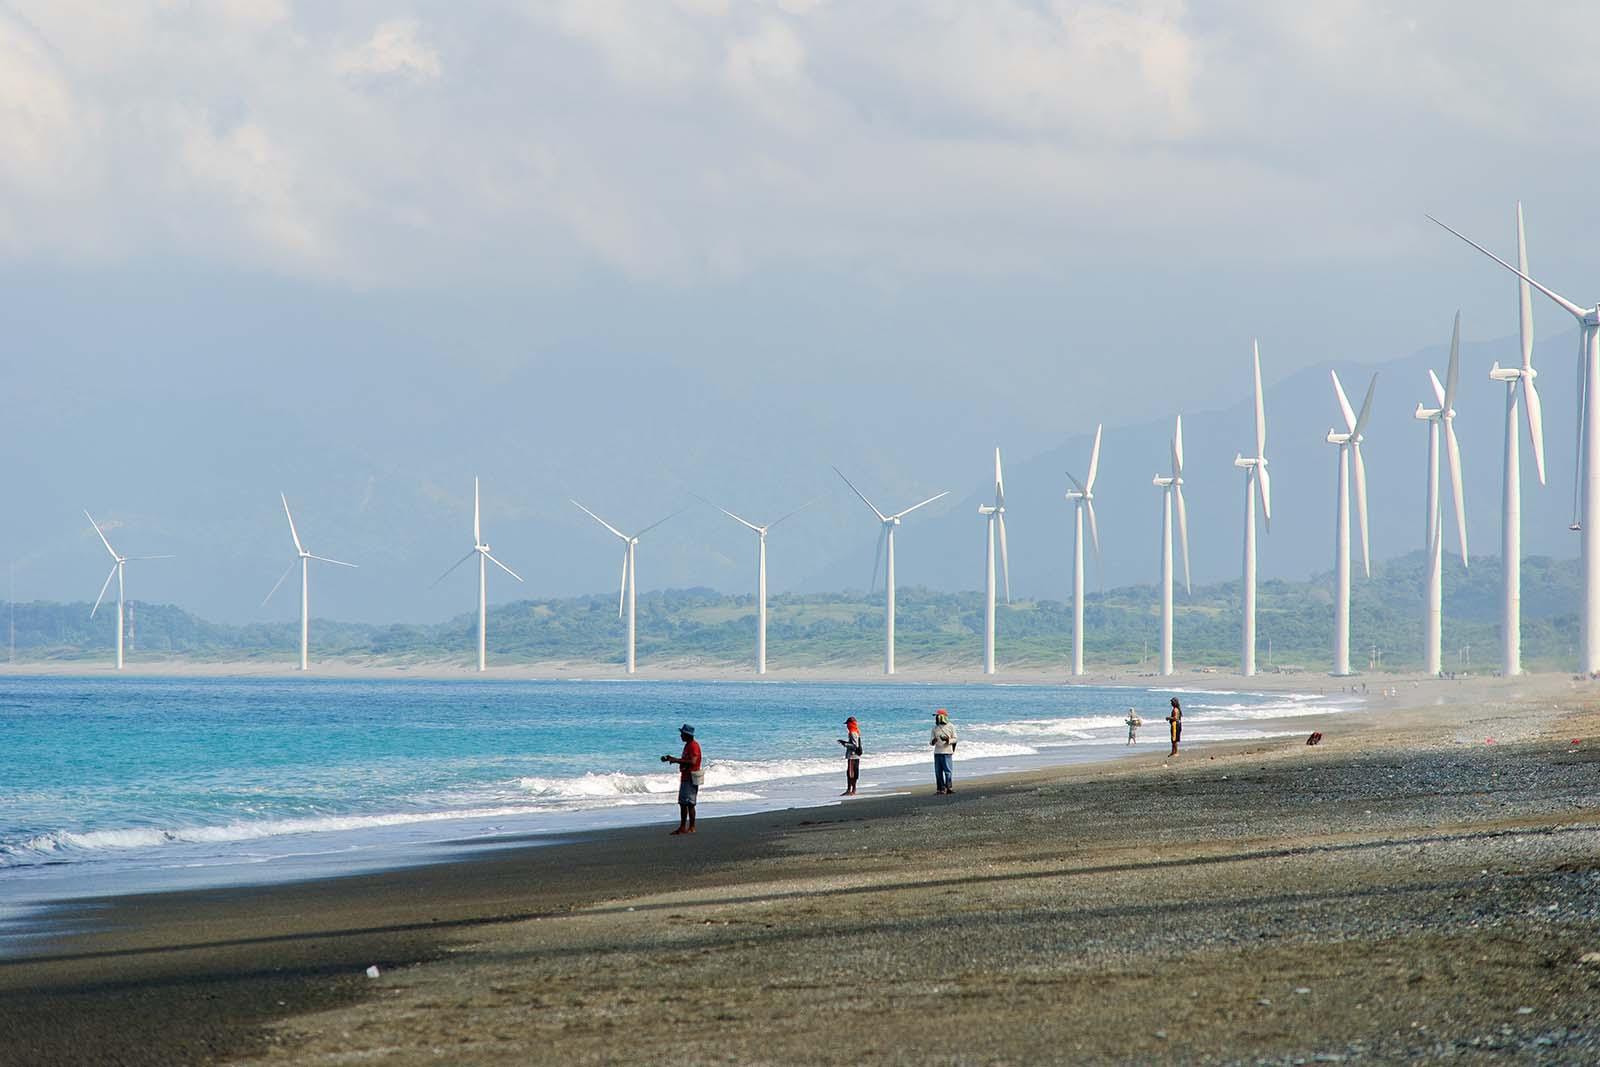 The Bangui Windmills